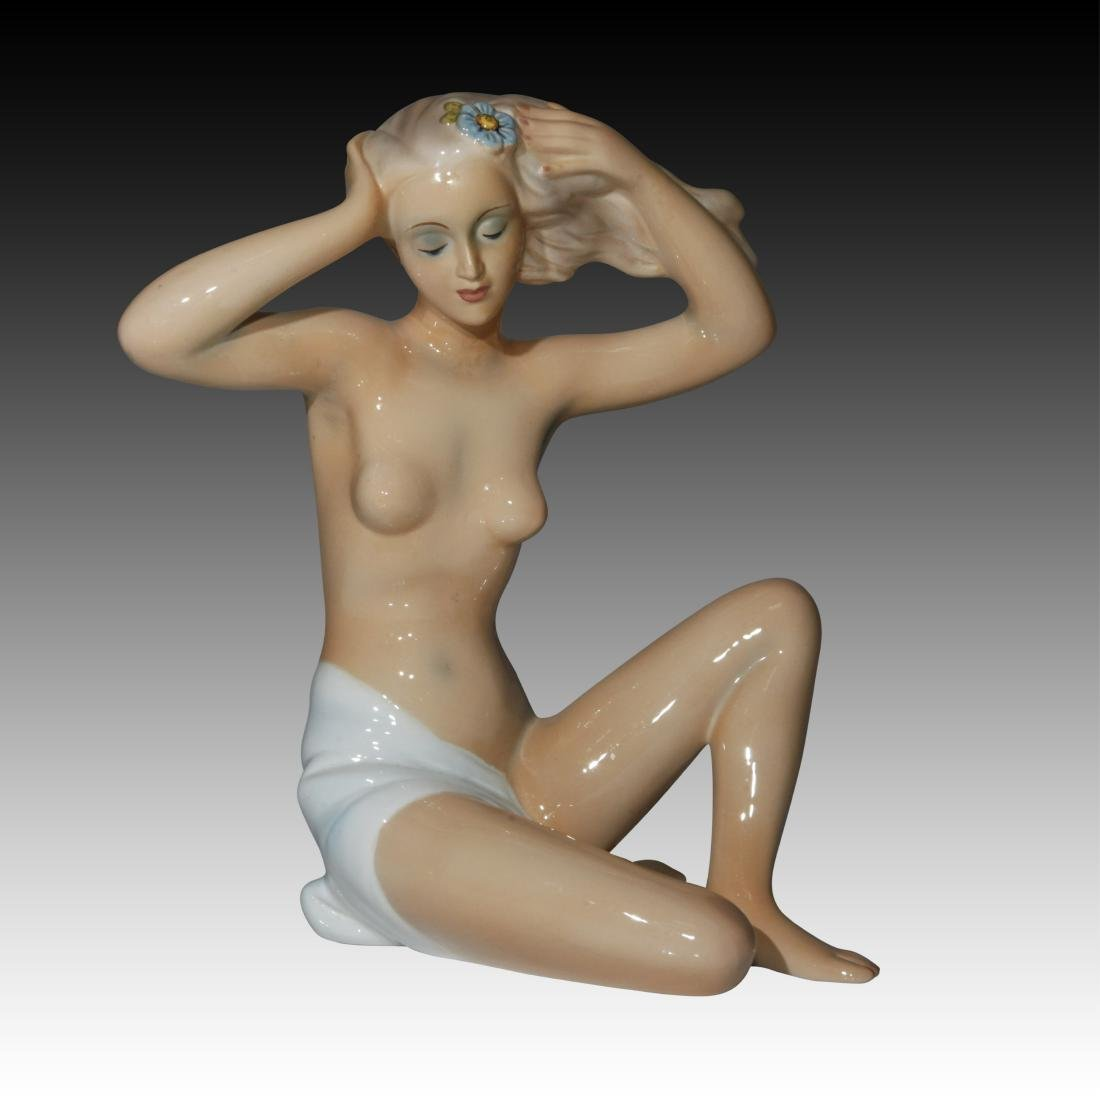 Italian Nude Female with a Flower in Hair Figurine